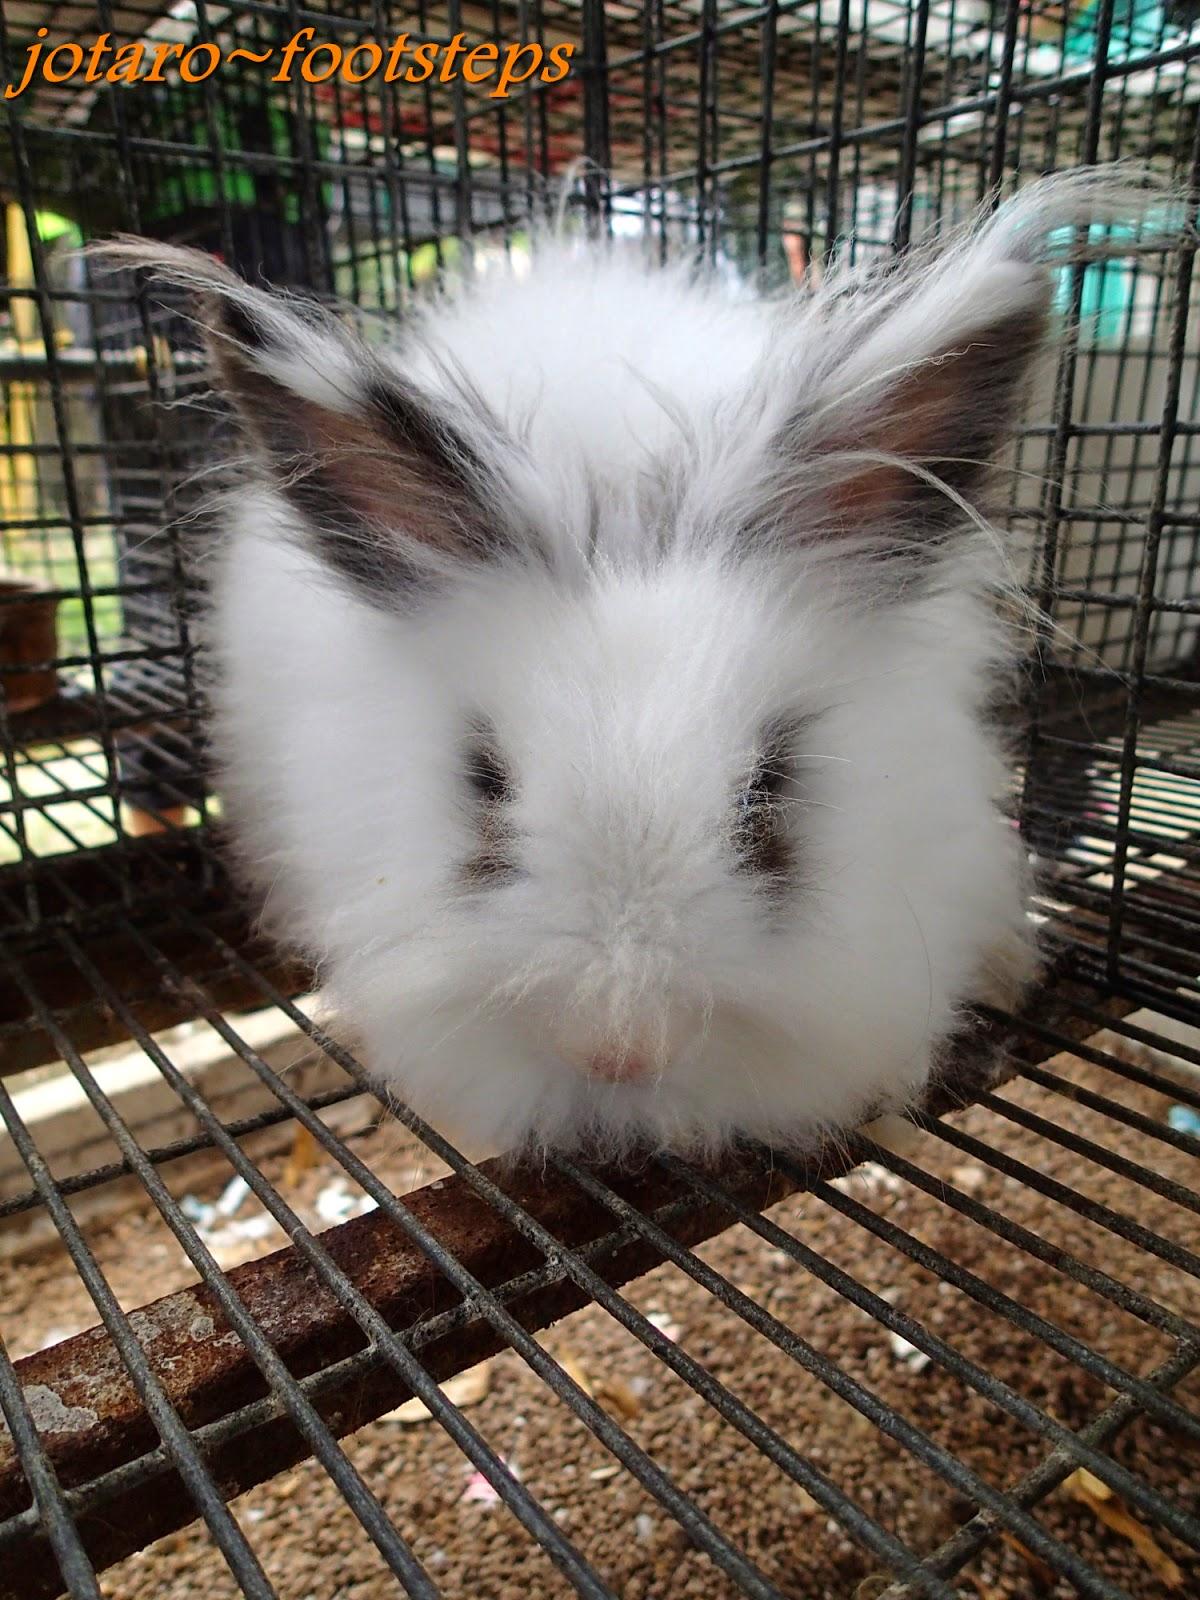 Footsteps Jotaro S Travels Malaysia 2014 Rabbit Farm